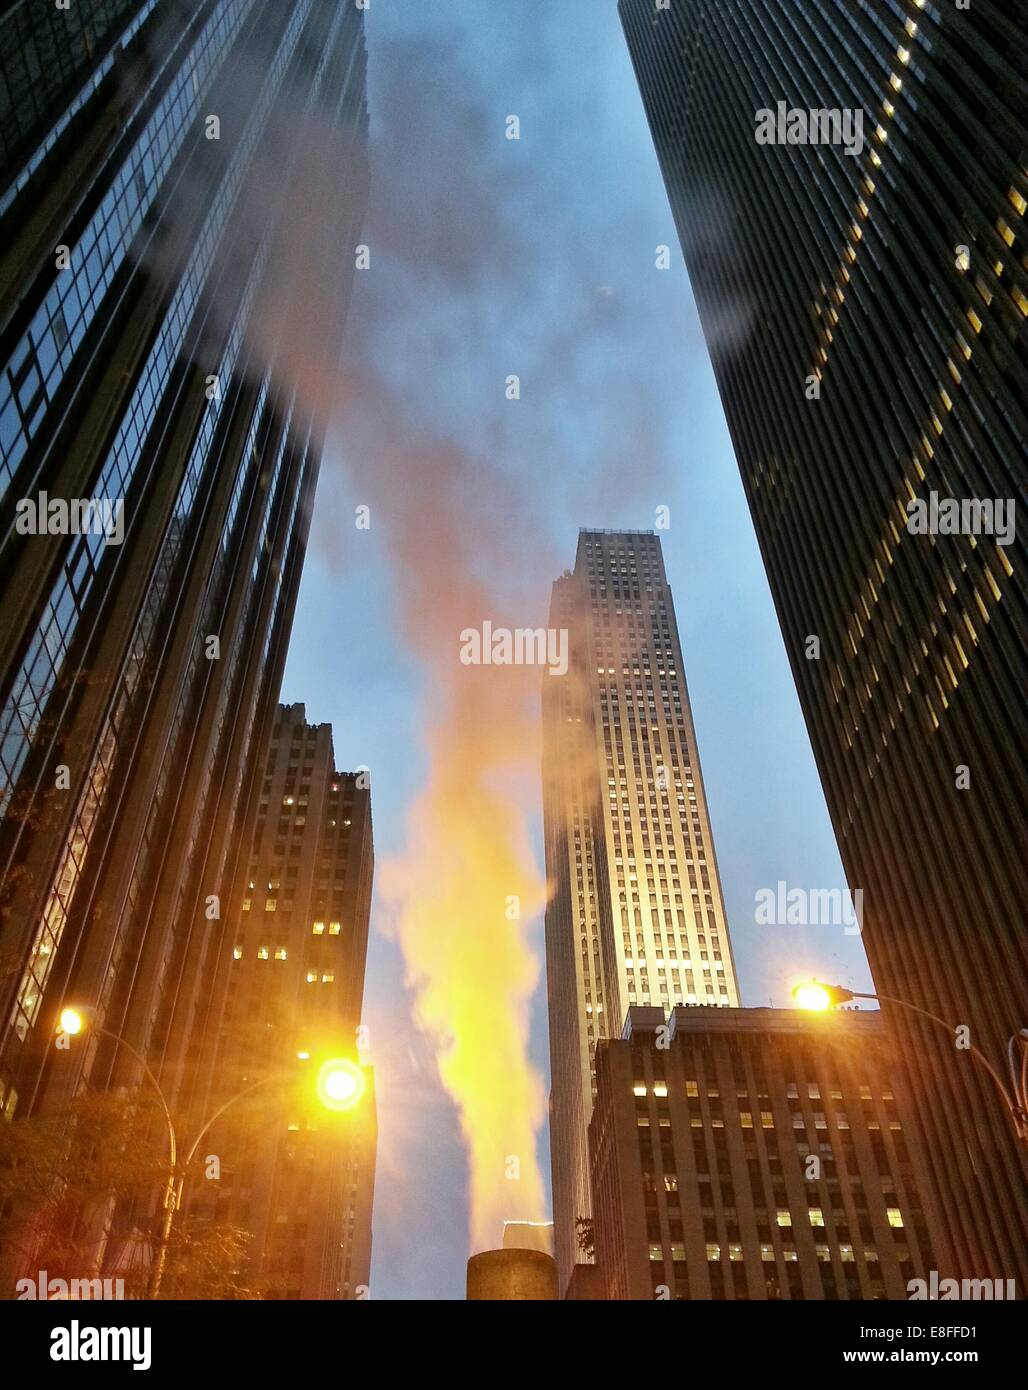 USA, New York State, New York City, Steam rising at Rockefeller Center - Stock Image